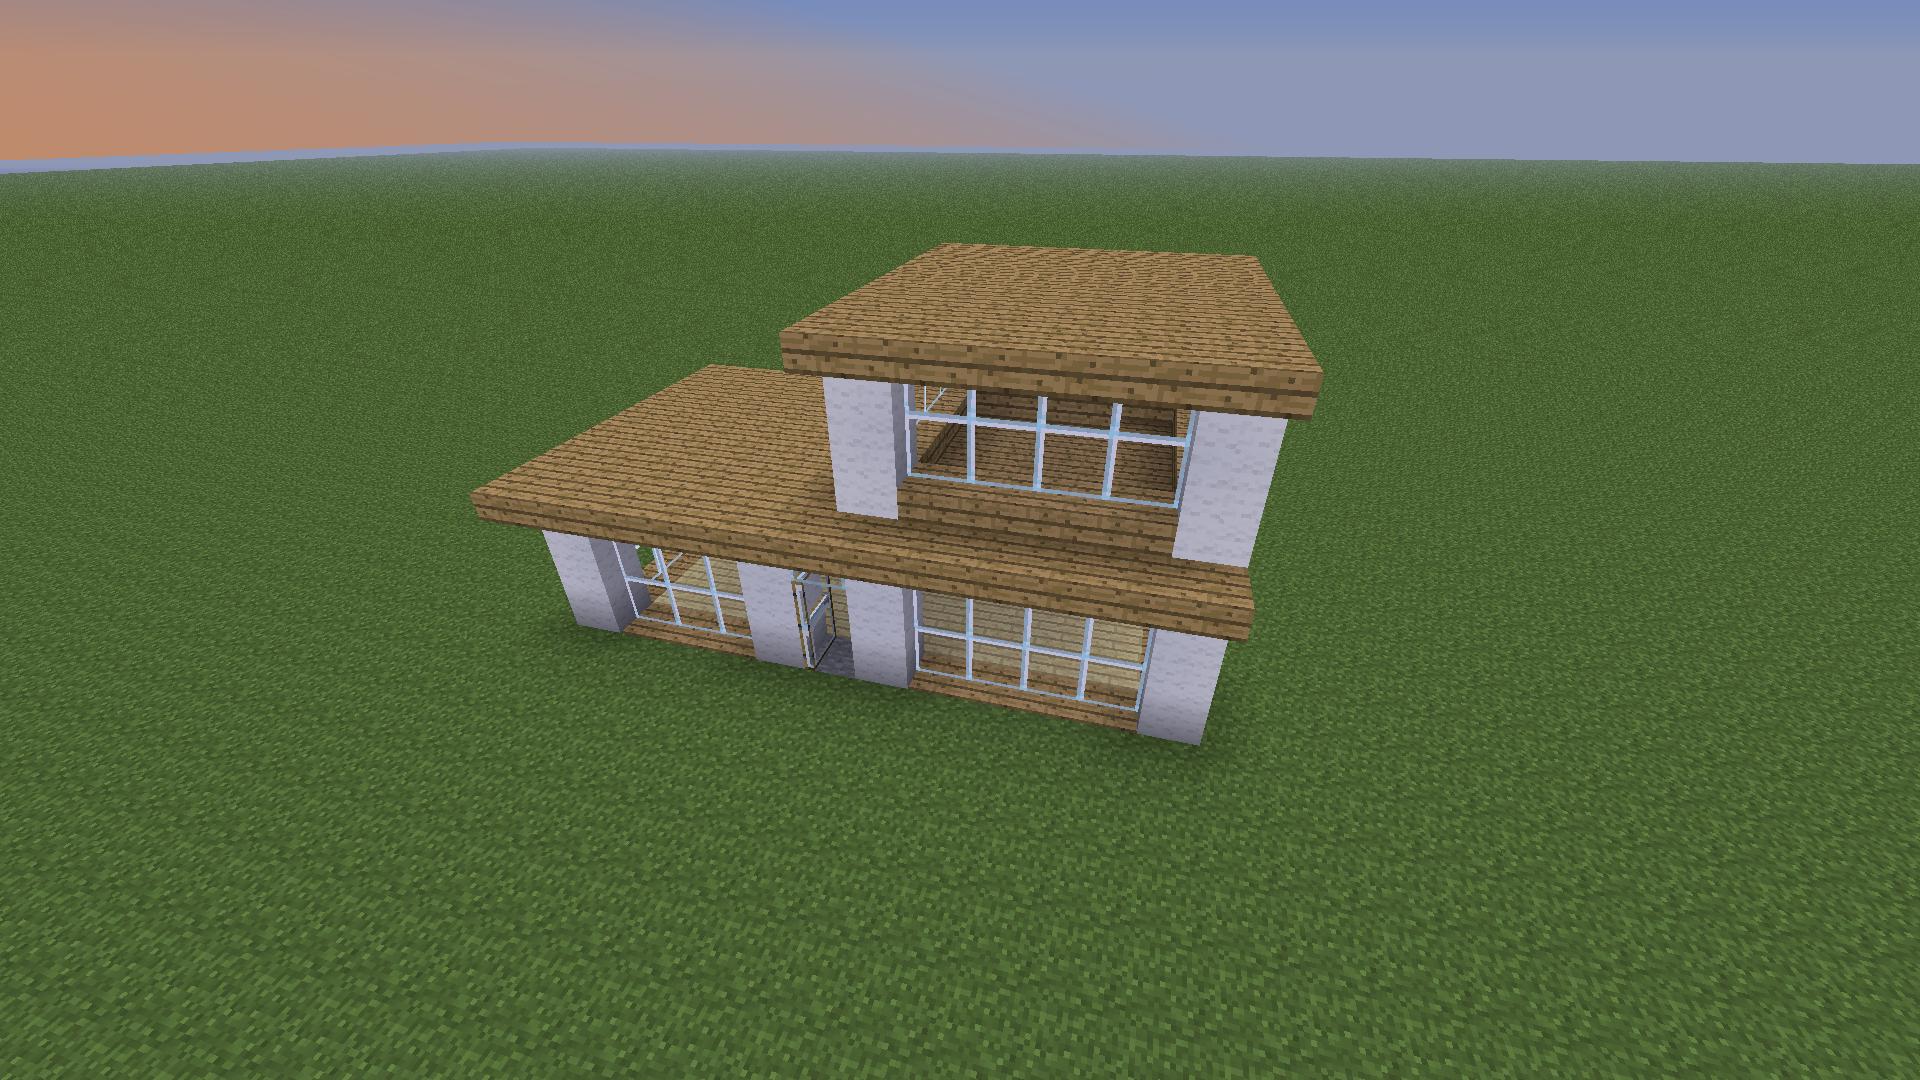 Basic Minecraft House (With Blueprints) « Minecraft ...